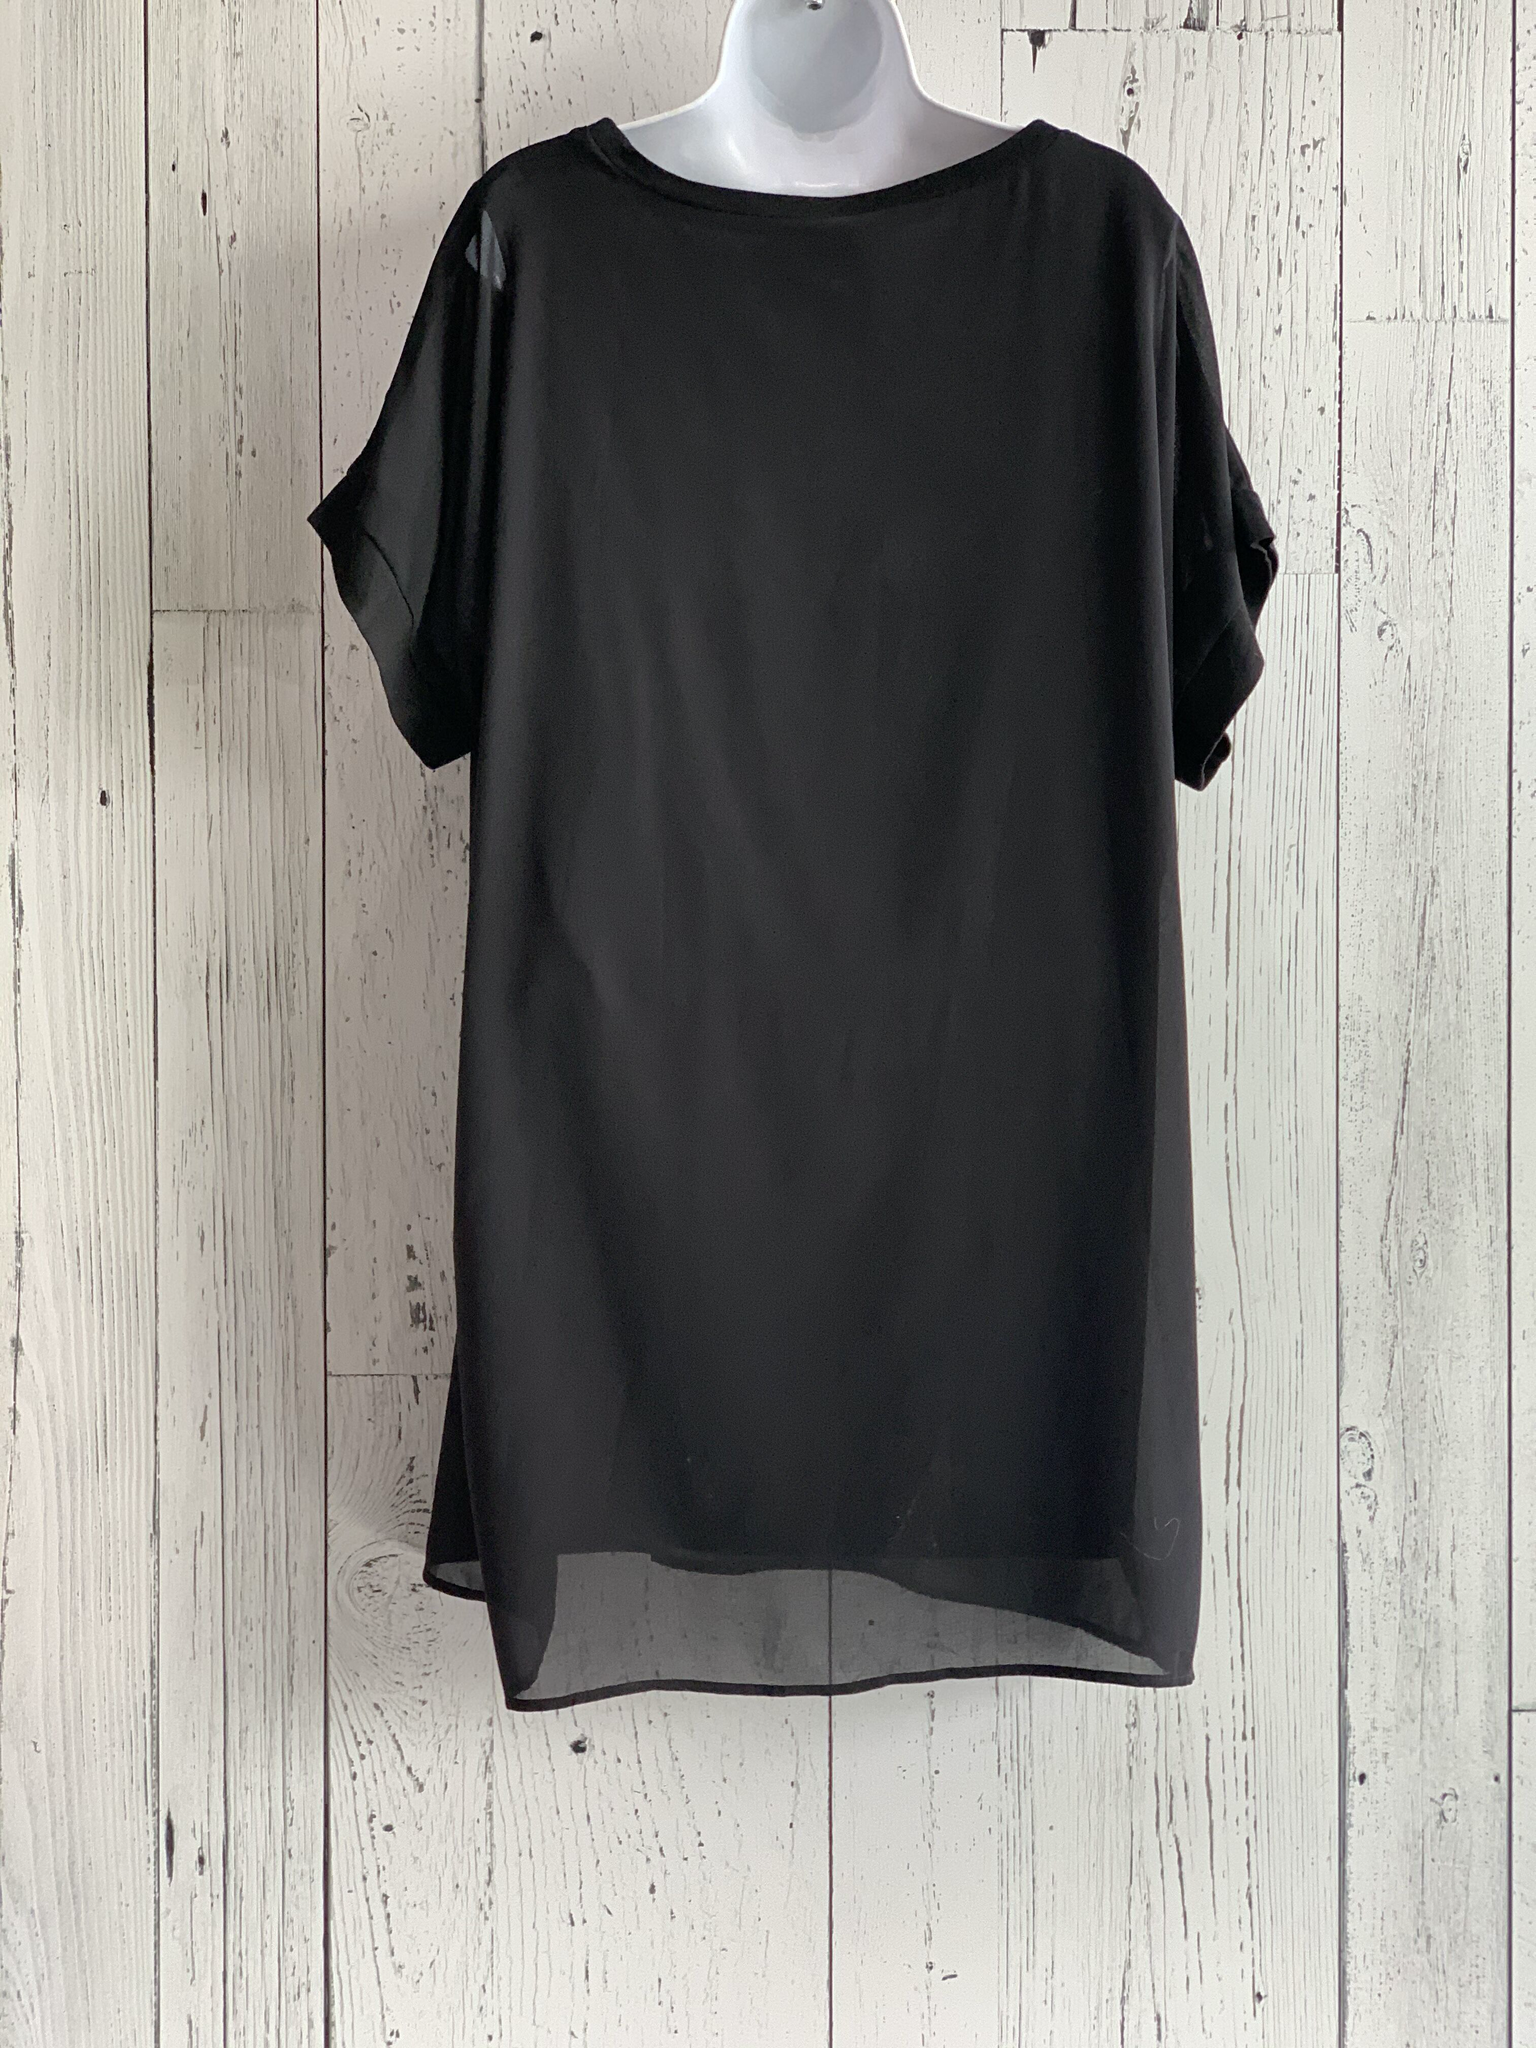 chiffon t-shirt tunic